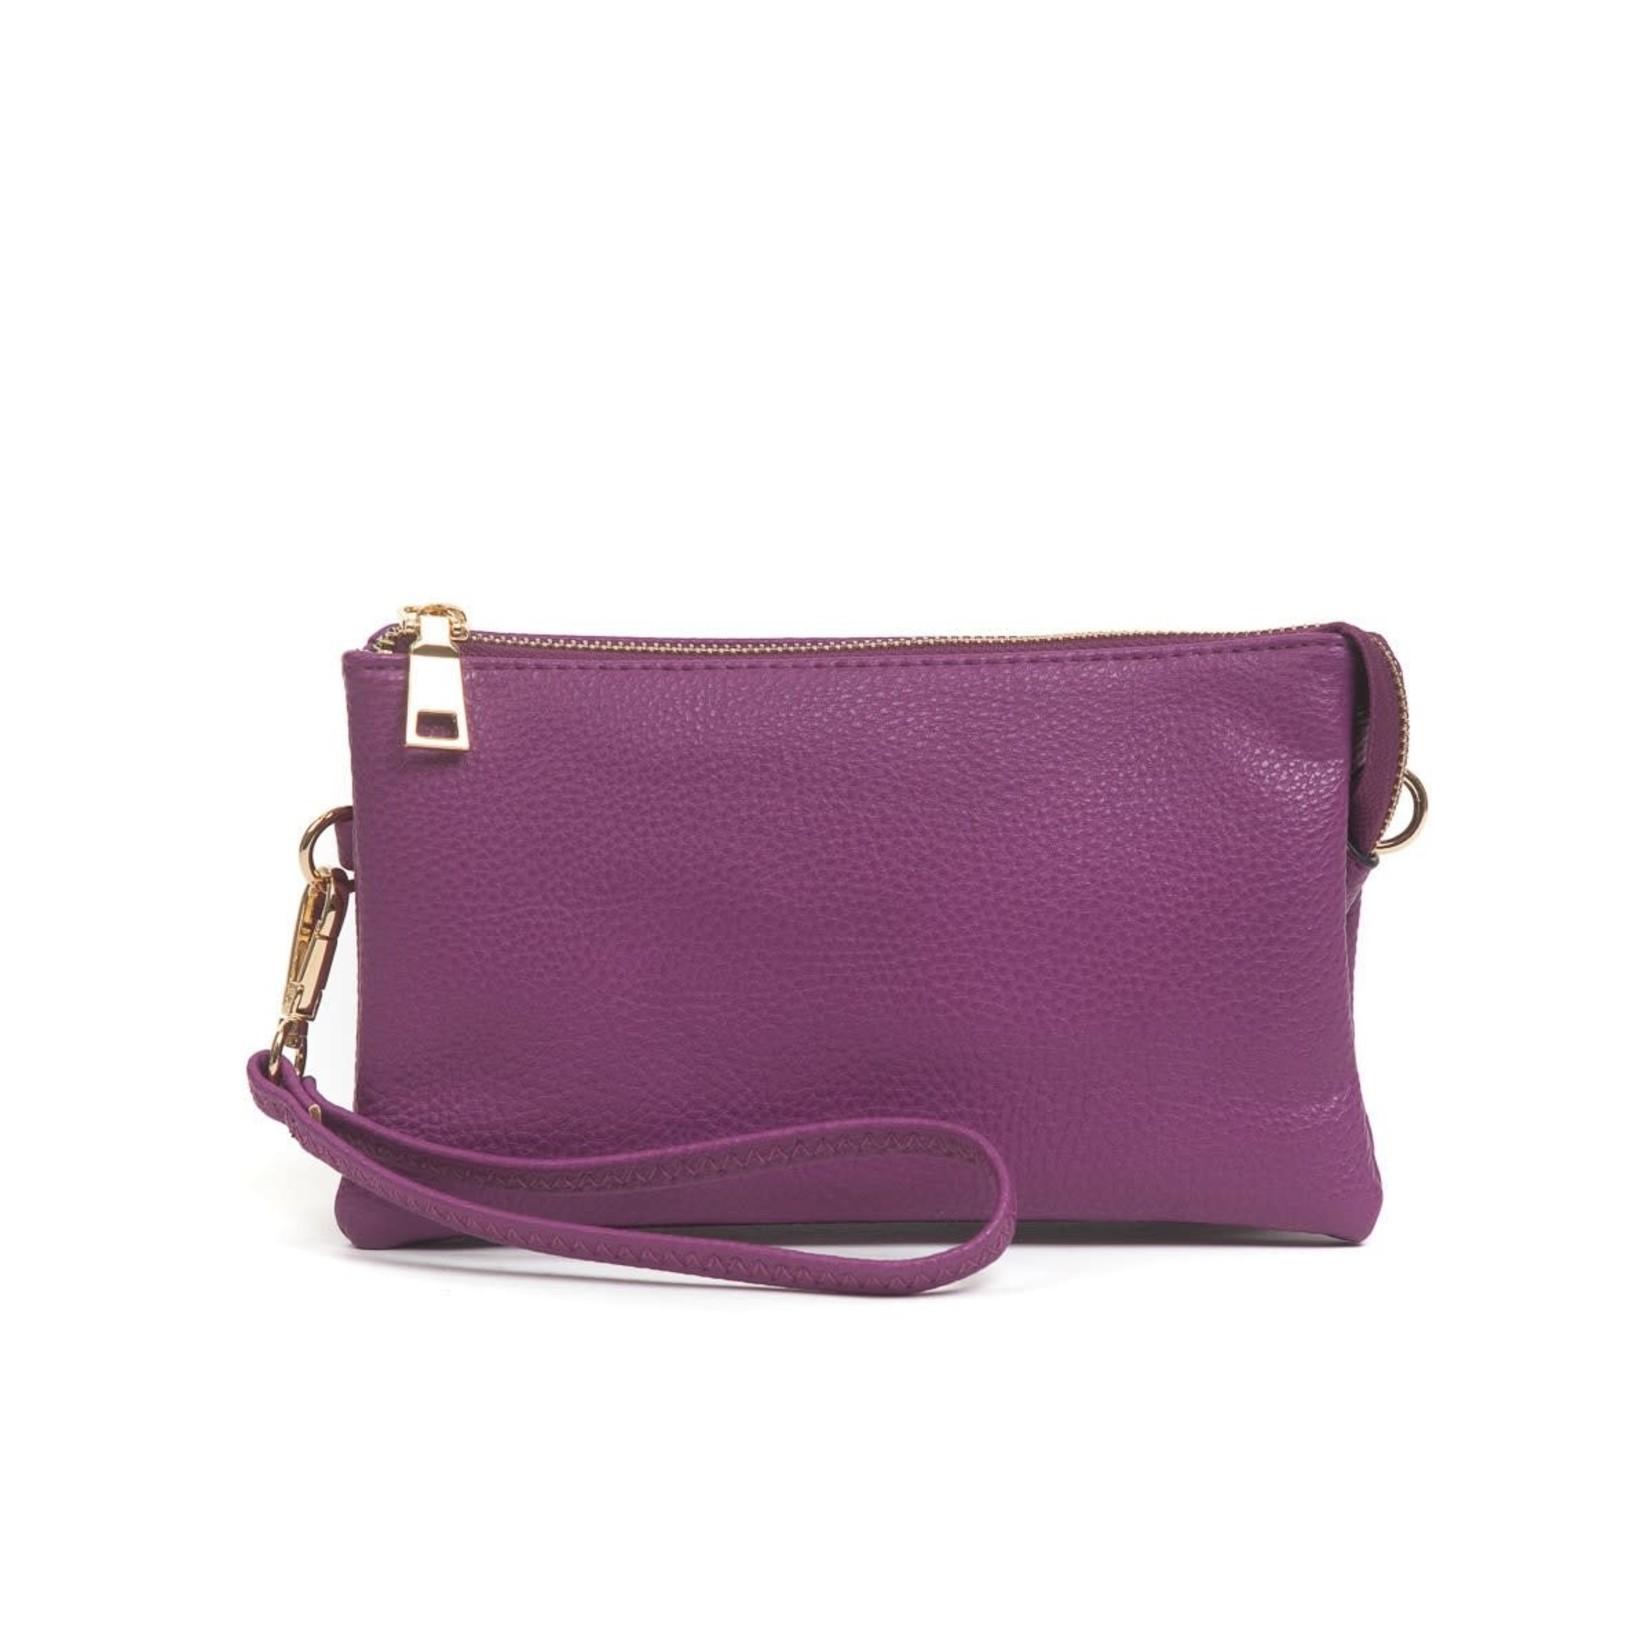 Riley - Vegan Leather Double-Sided Wristlet/Crossbody - Purple(PP)